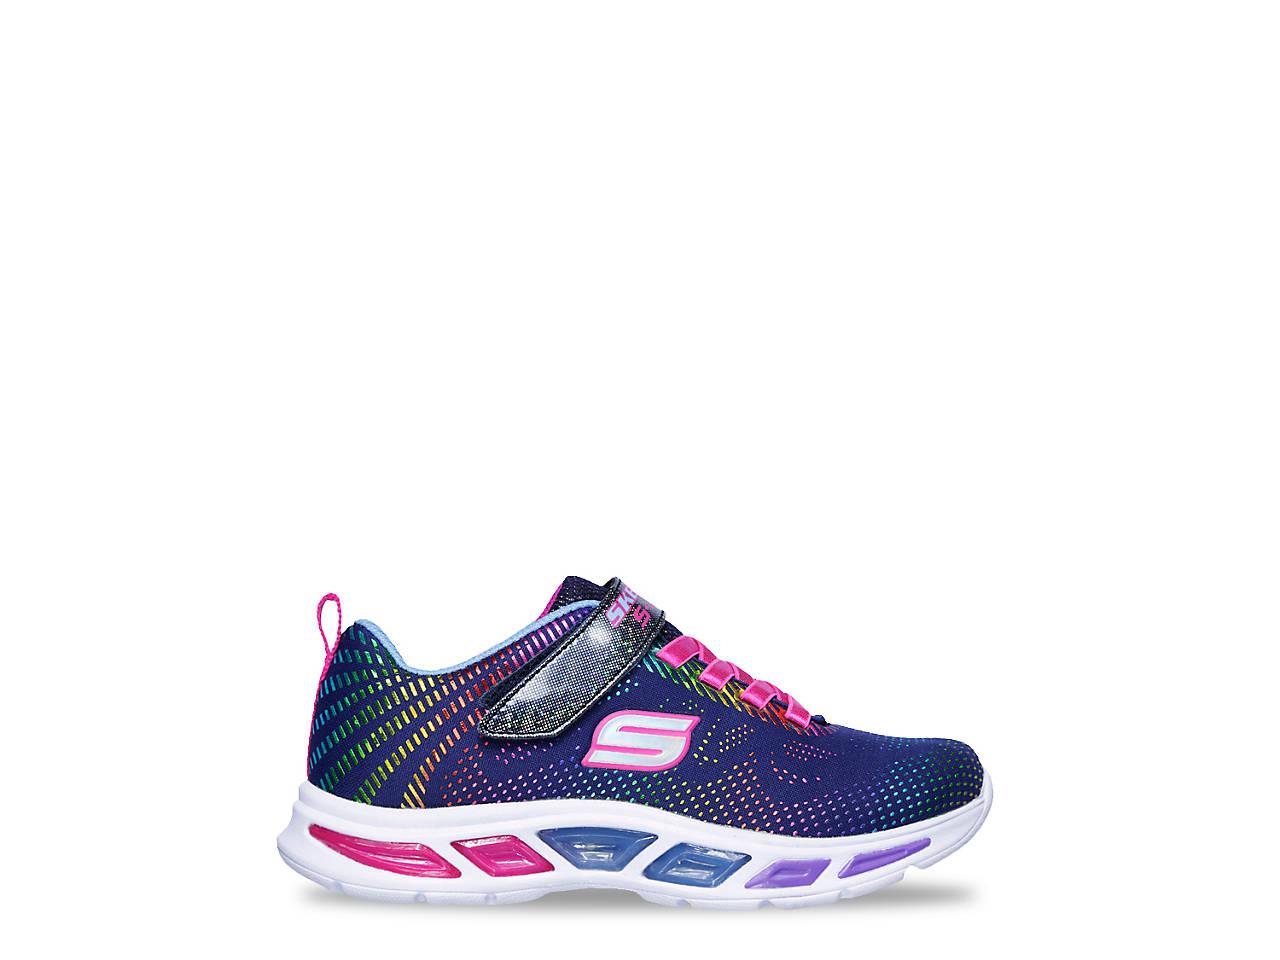 887d29468244 S Lights Litebeams Gleam N Dream Toddler   Youth Light-Up Sneaker. next